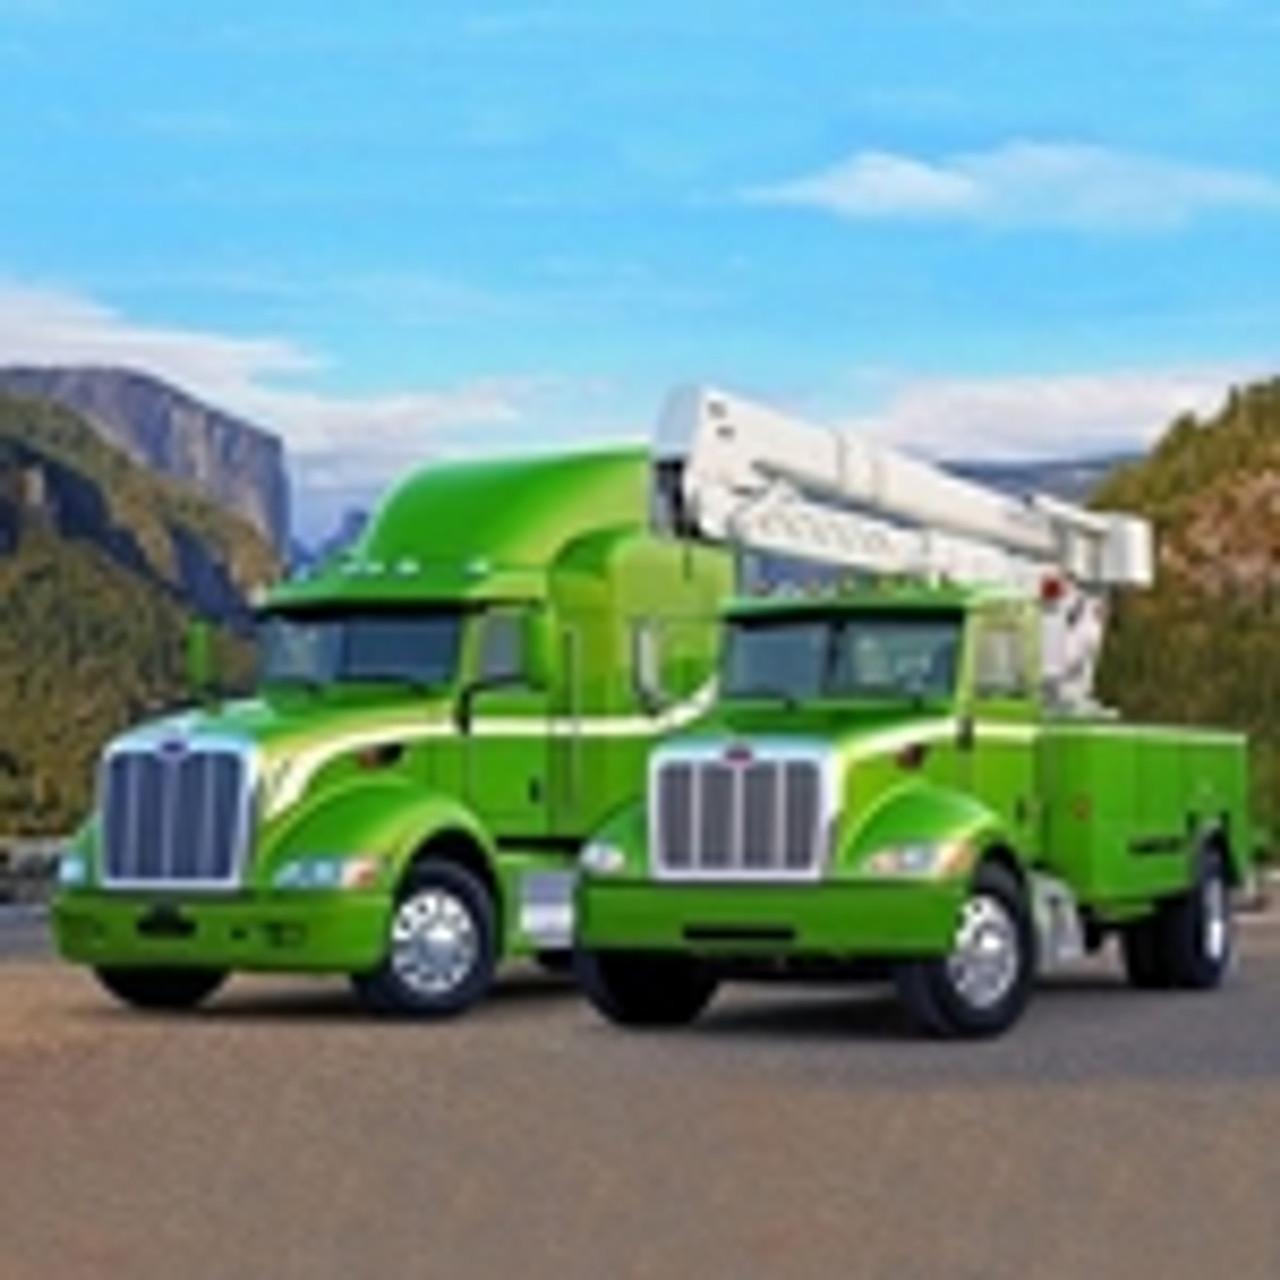 Medium-Heavy Duty Trucks